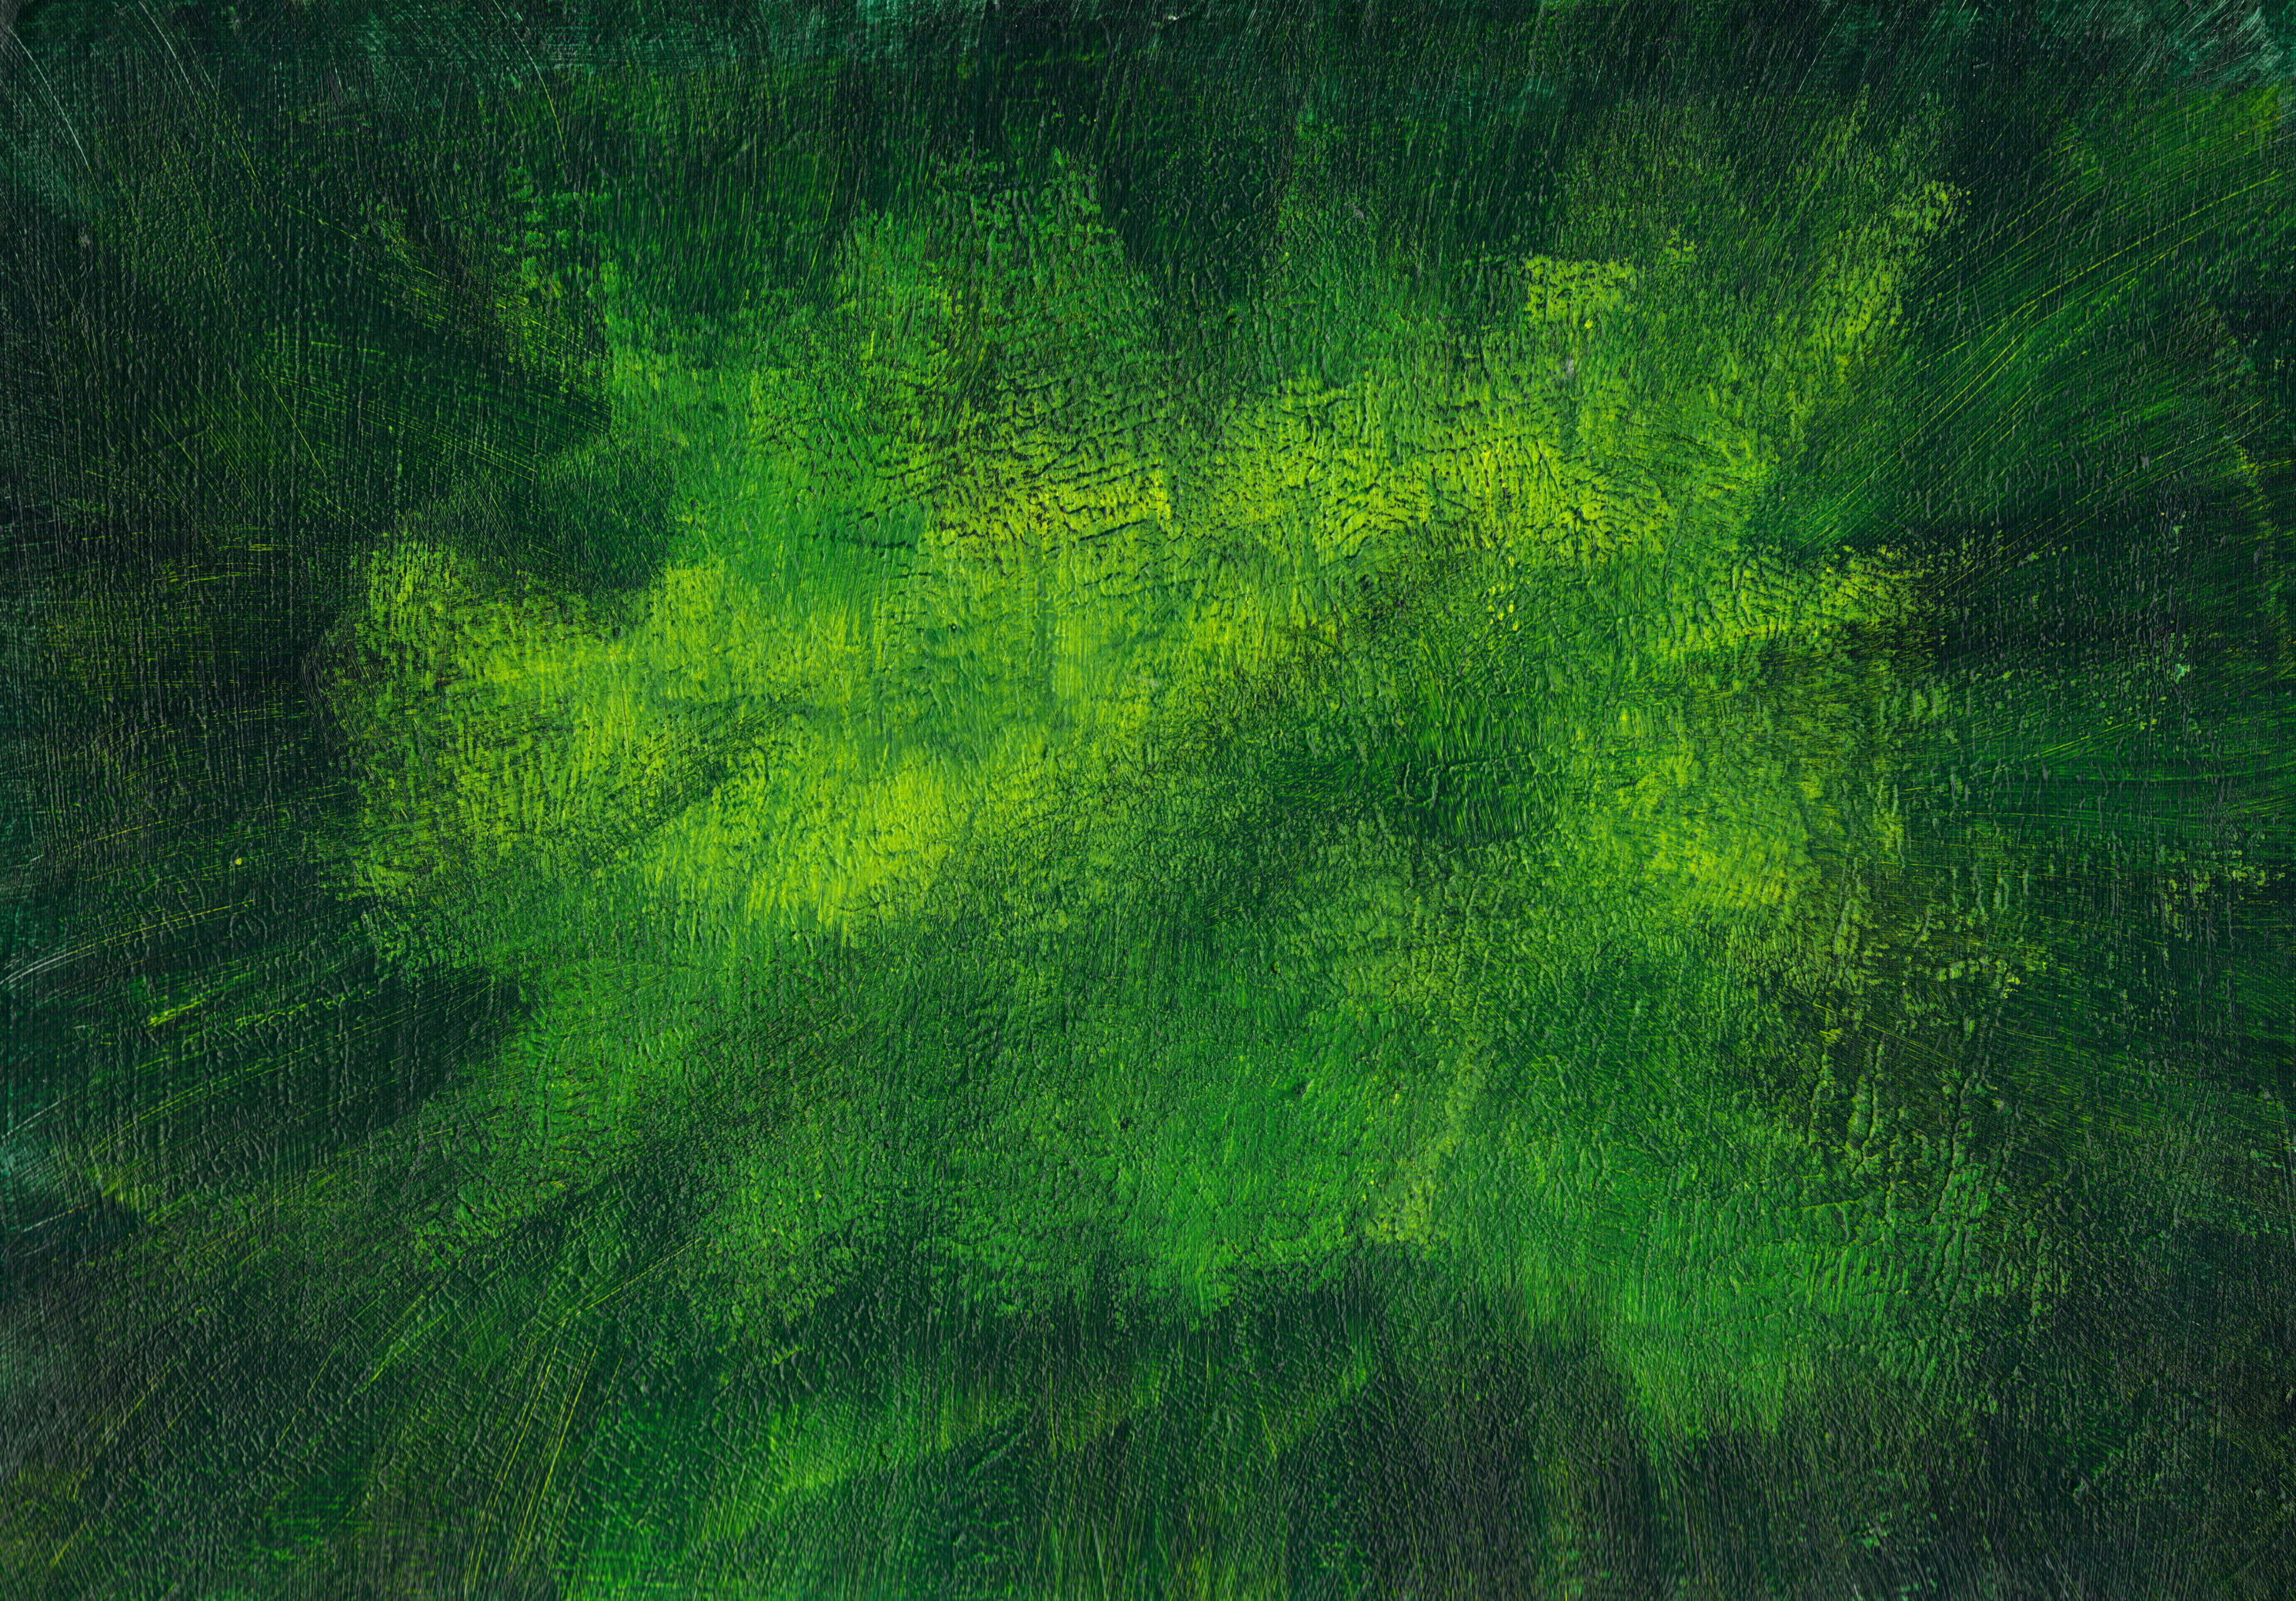 Green Brush Paint Texture Jpg Onlygfx Com